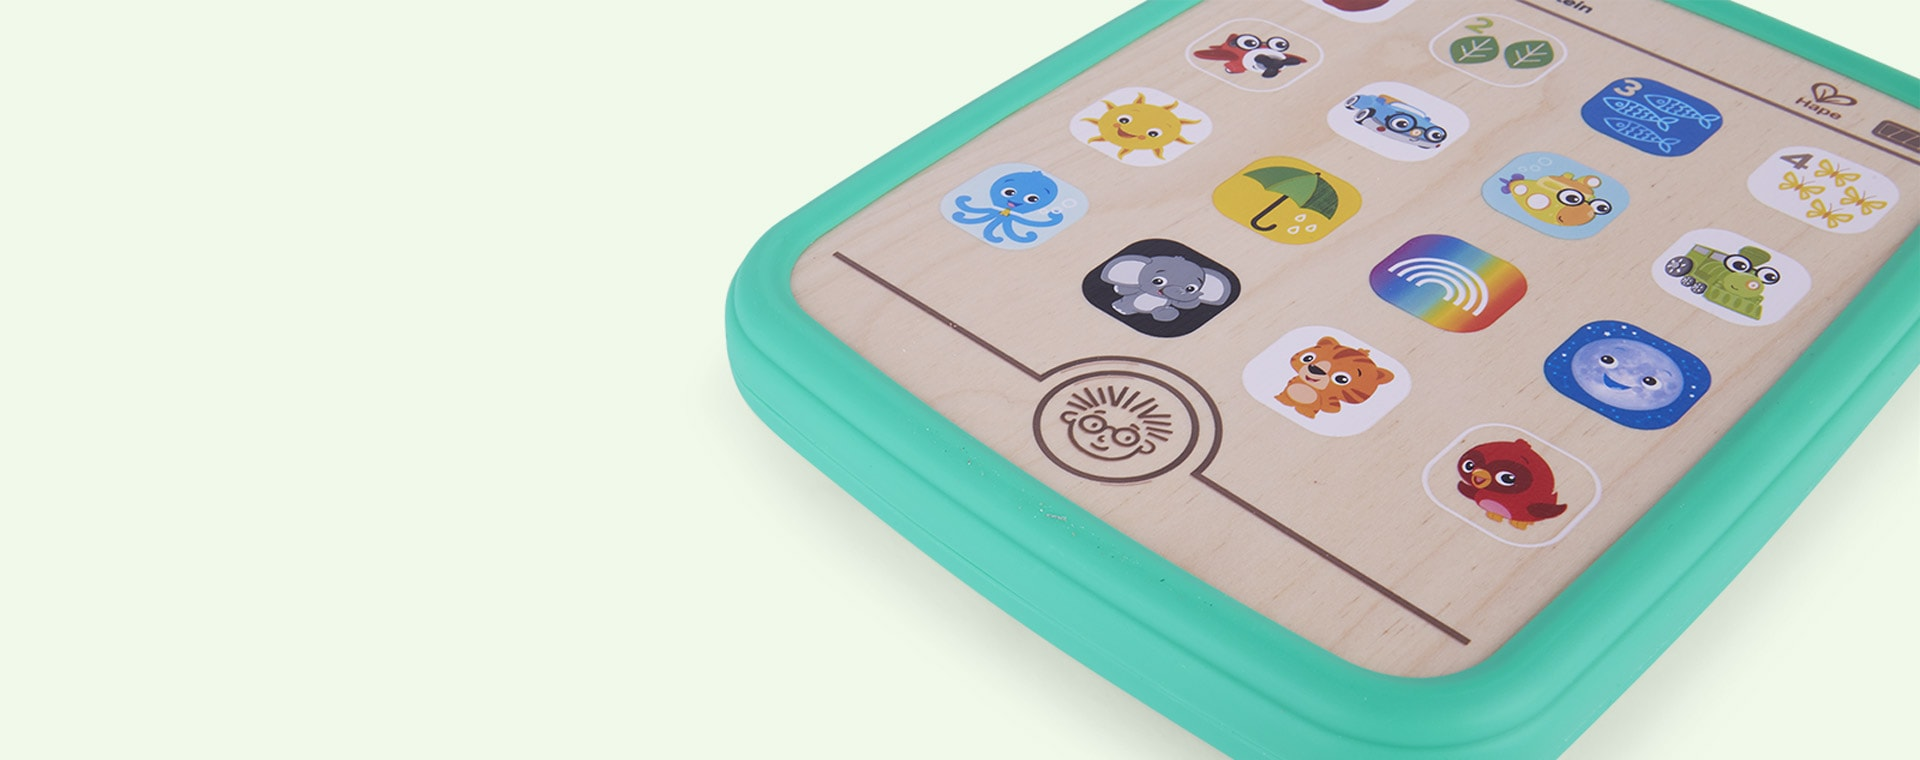 Multi Hape Magic Touch Curiosity Tablet